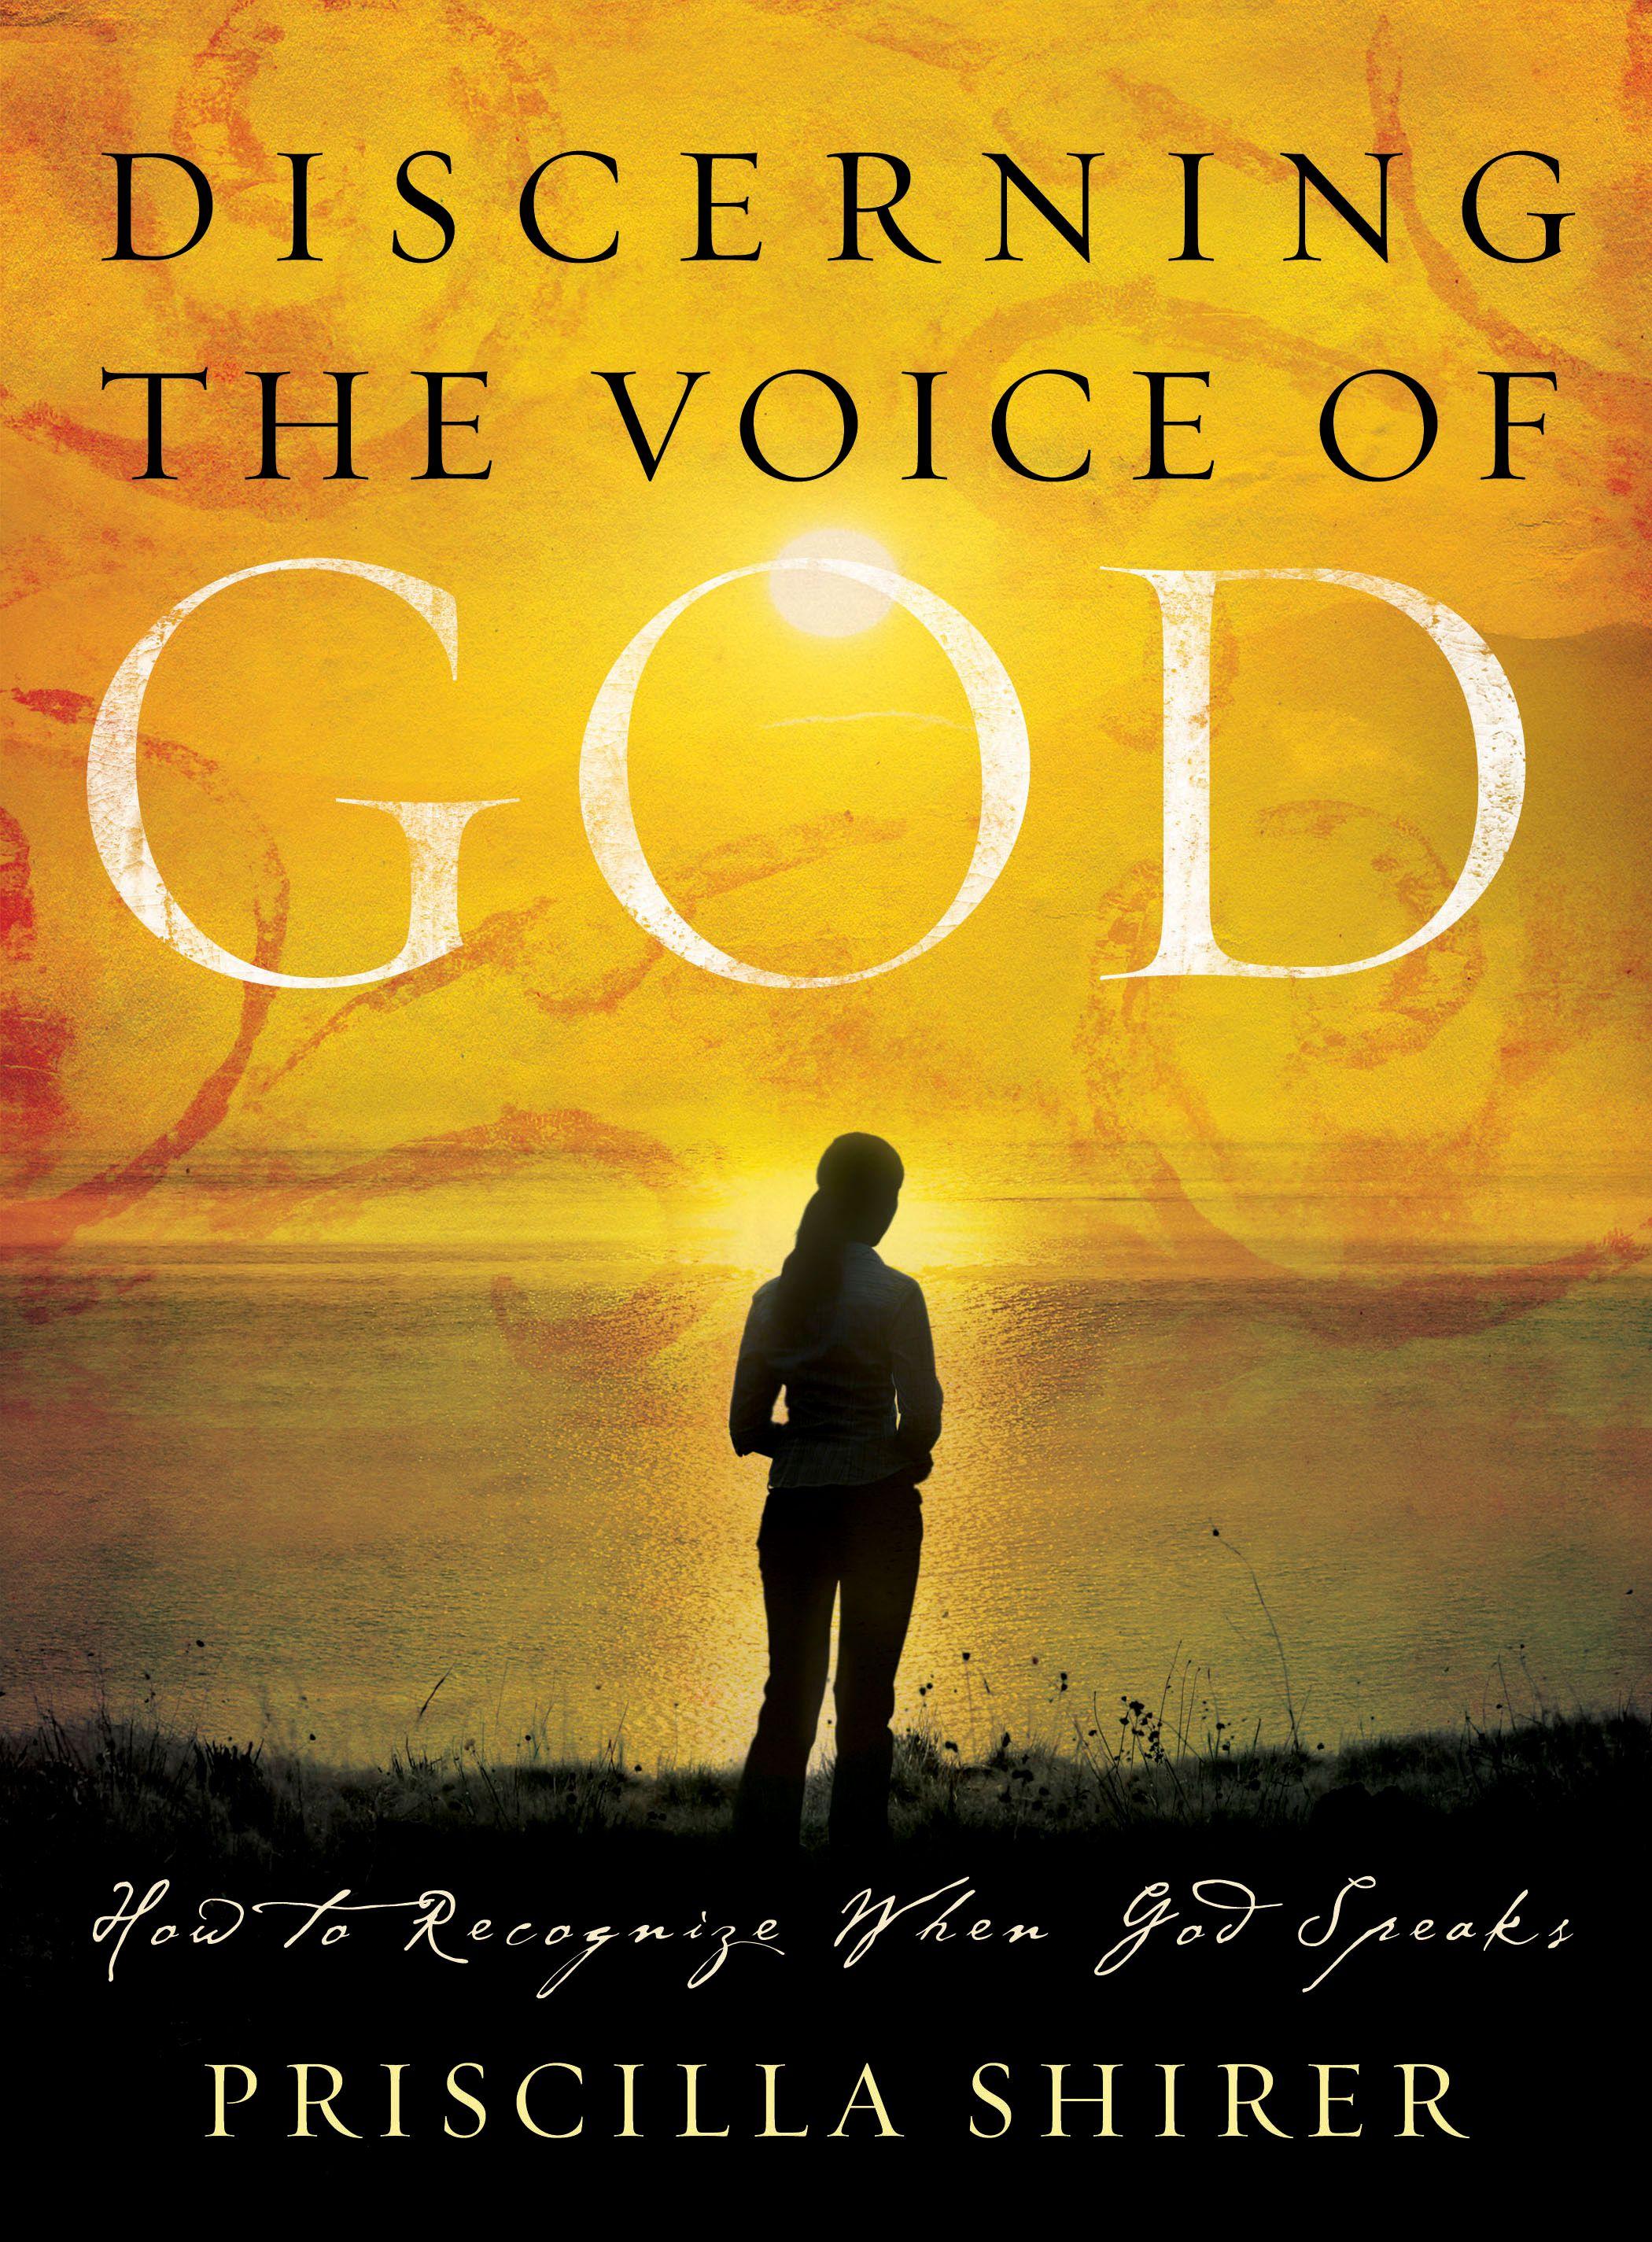 Discerning The Voice Of God Workbook Revised Ed Priscilla